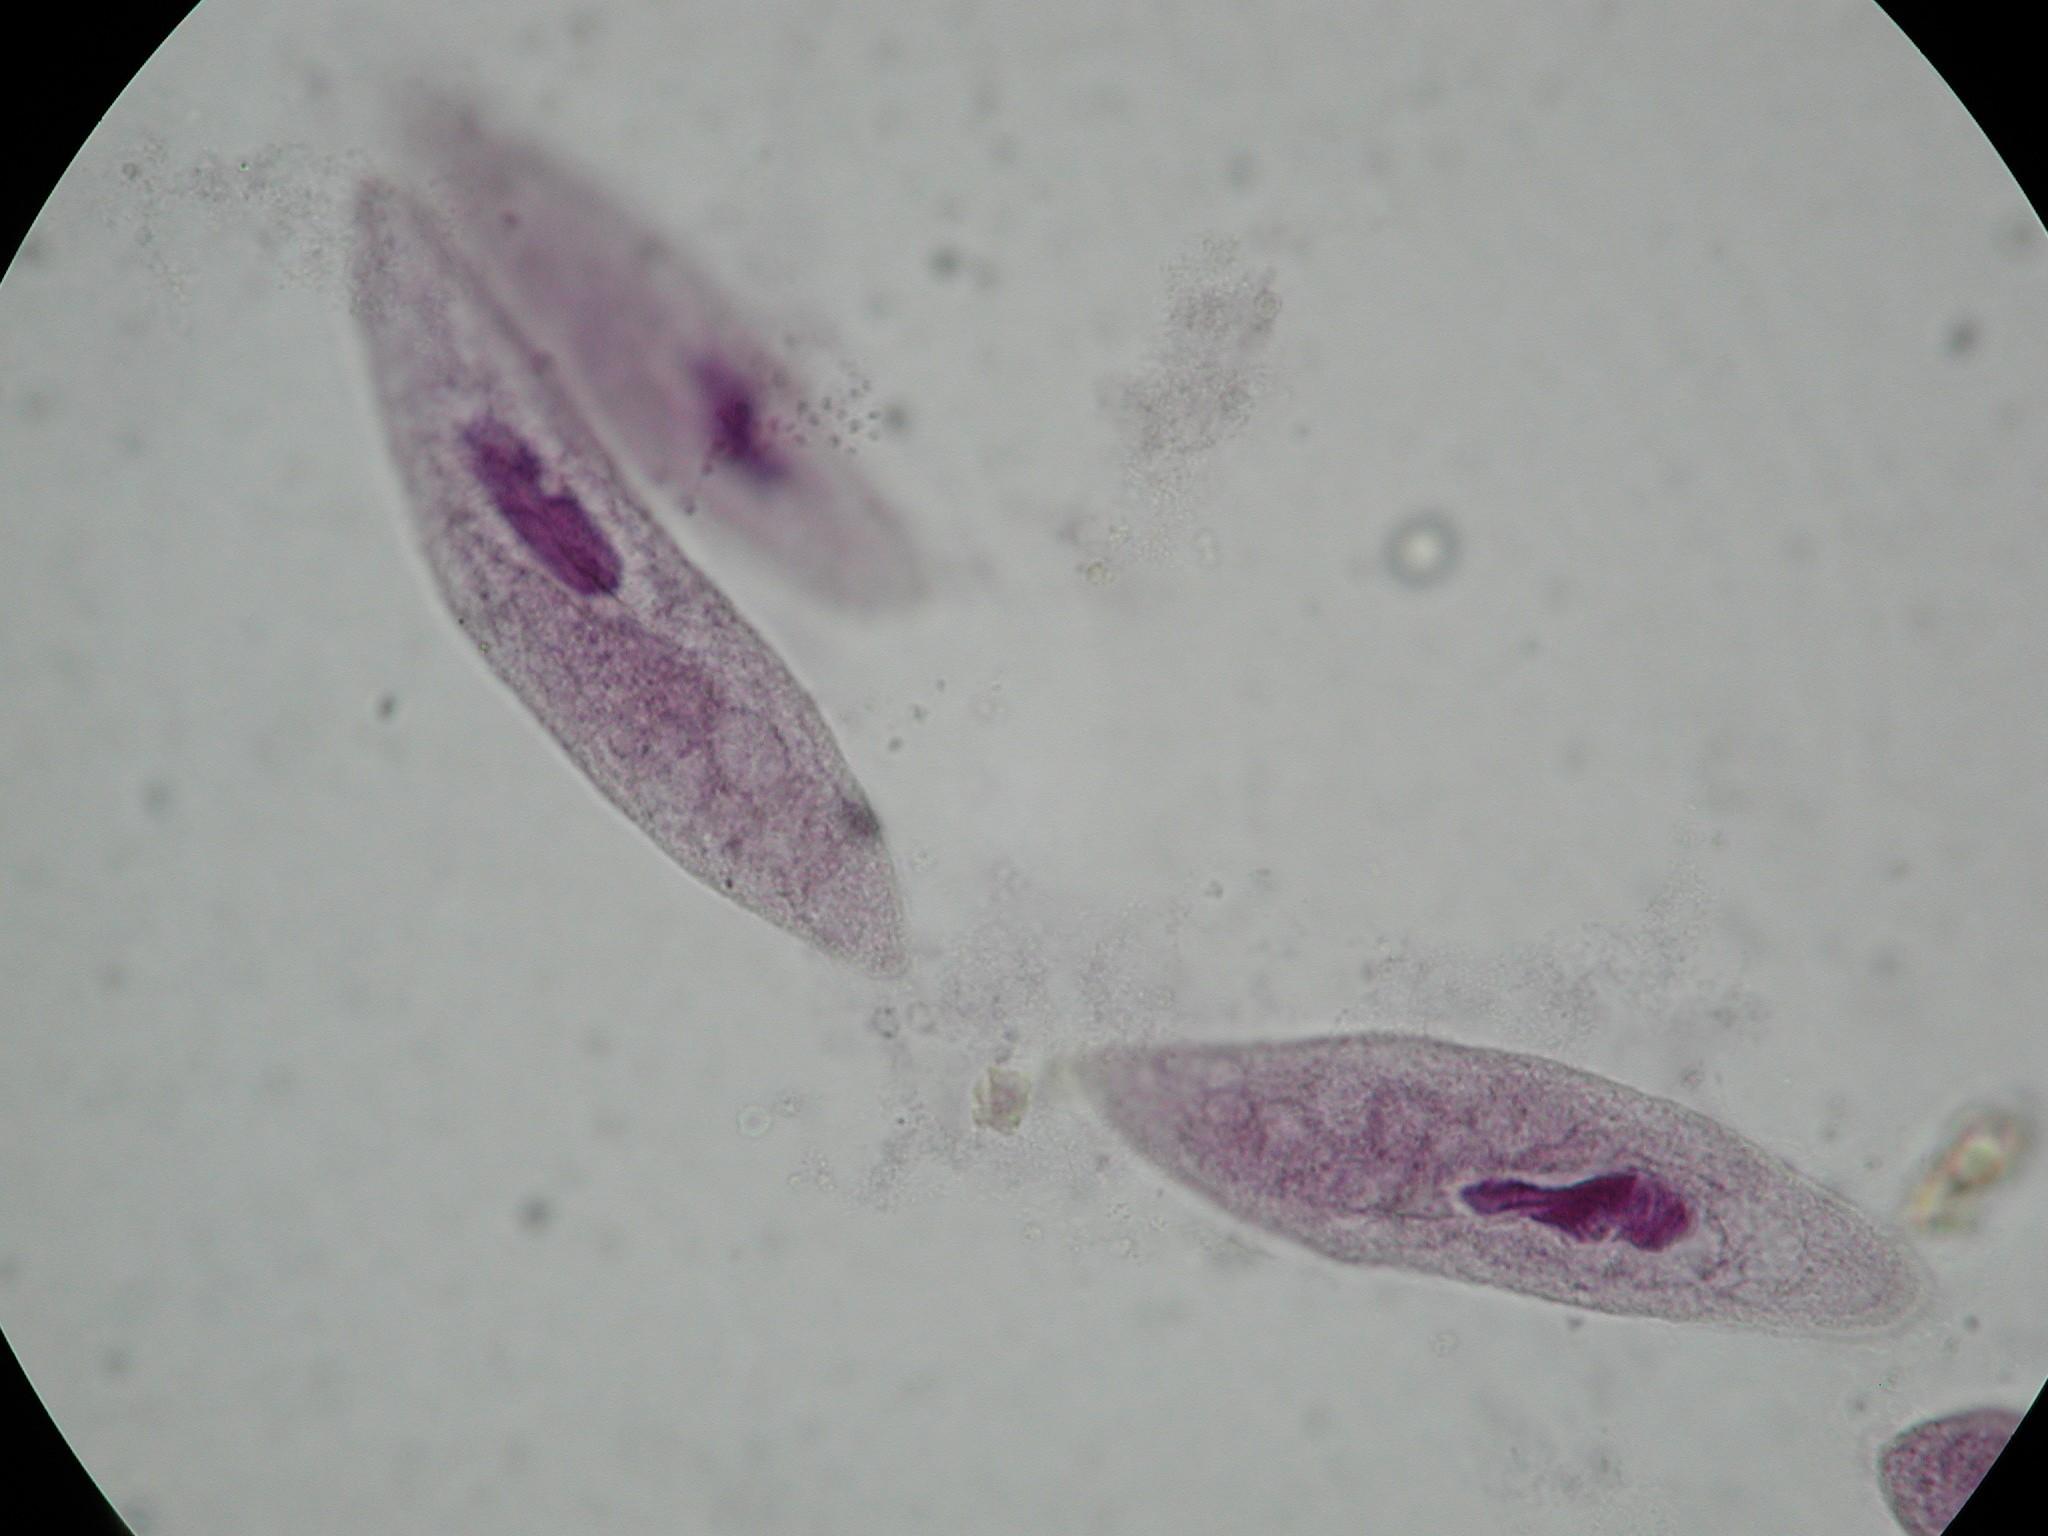 Protozoa and Porifera